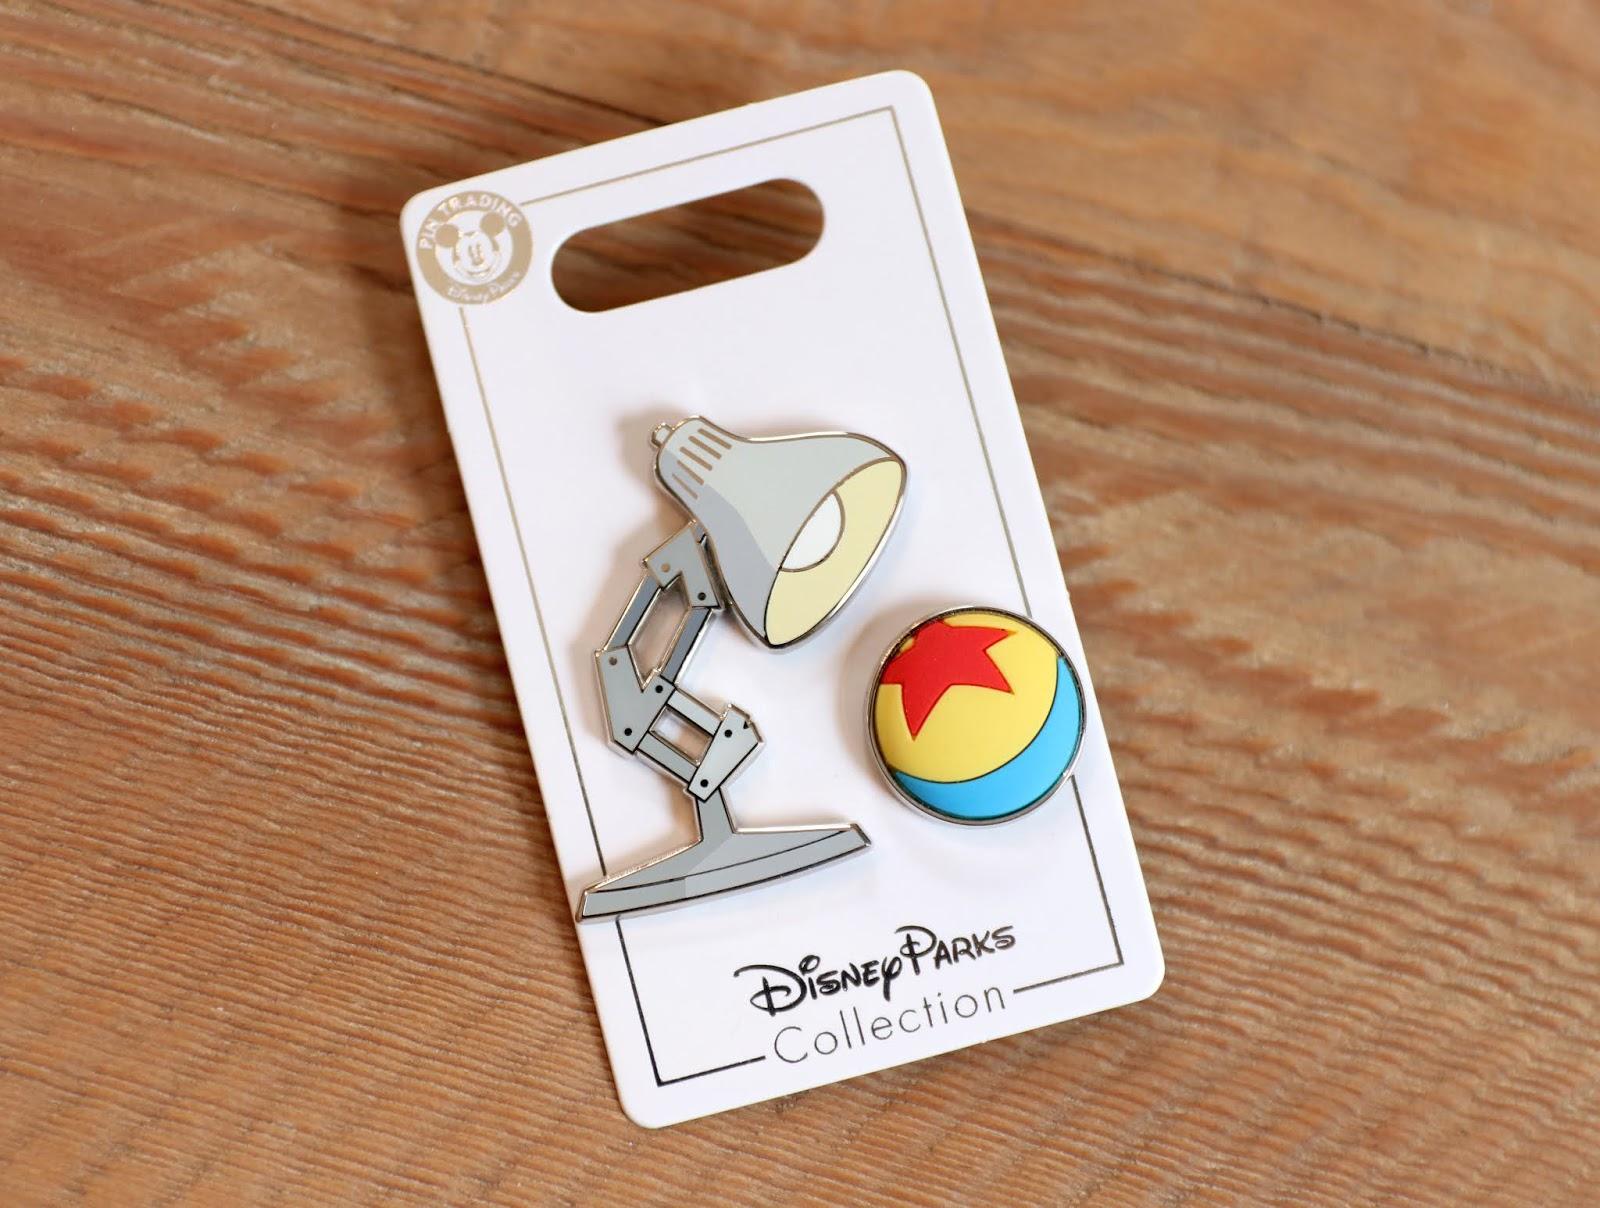 Disney Parks Collection Luxo Jr. Pin Set